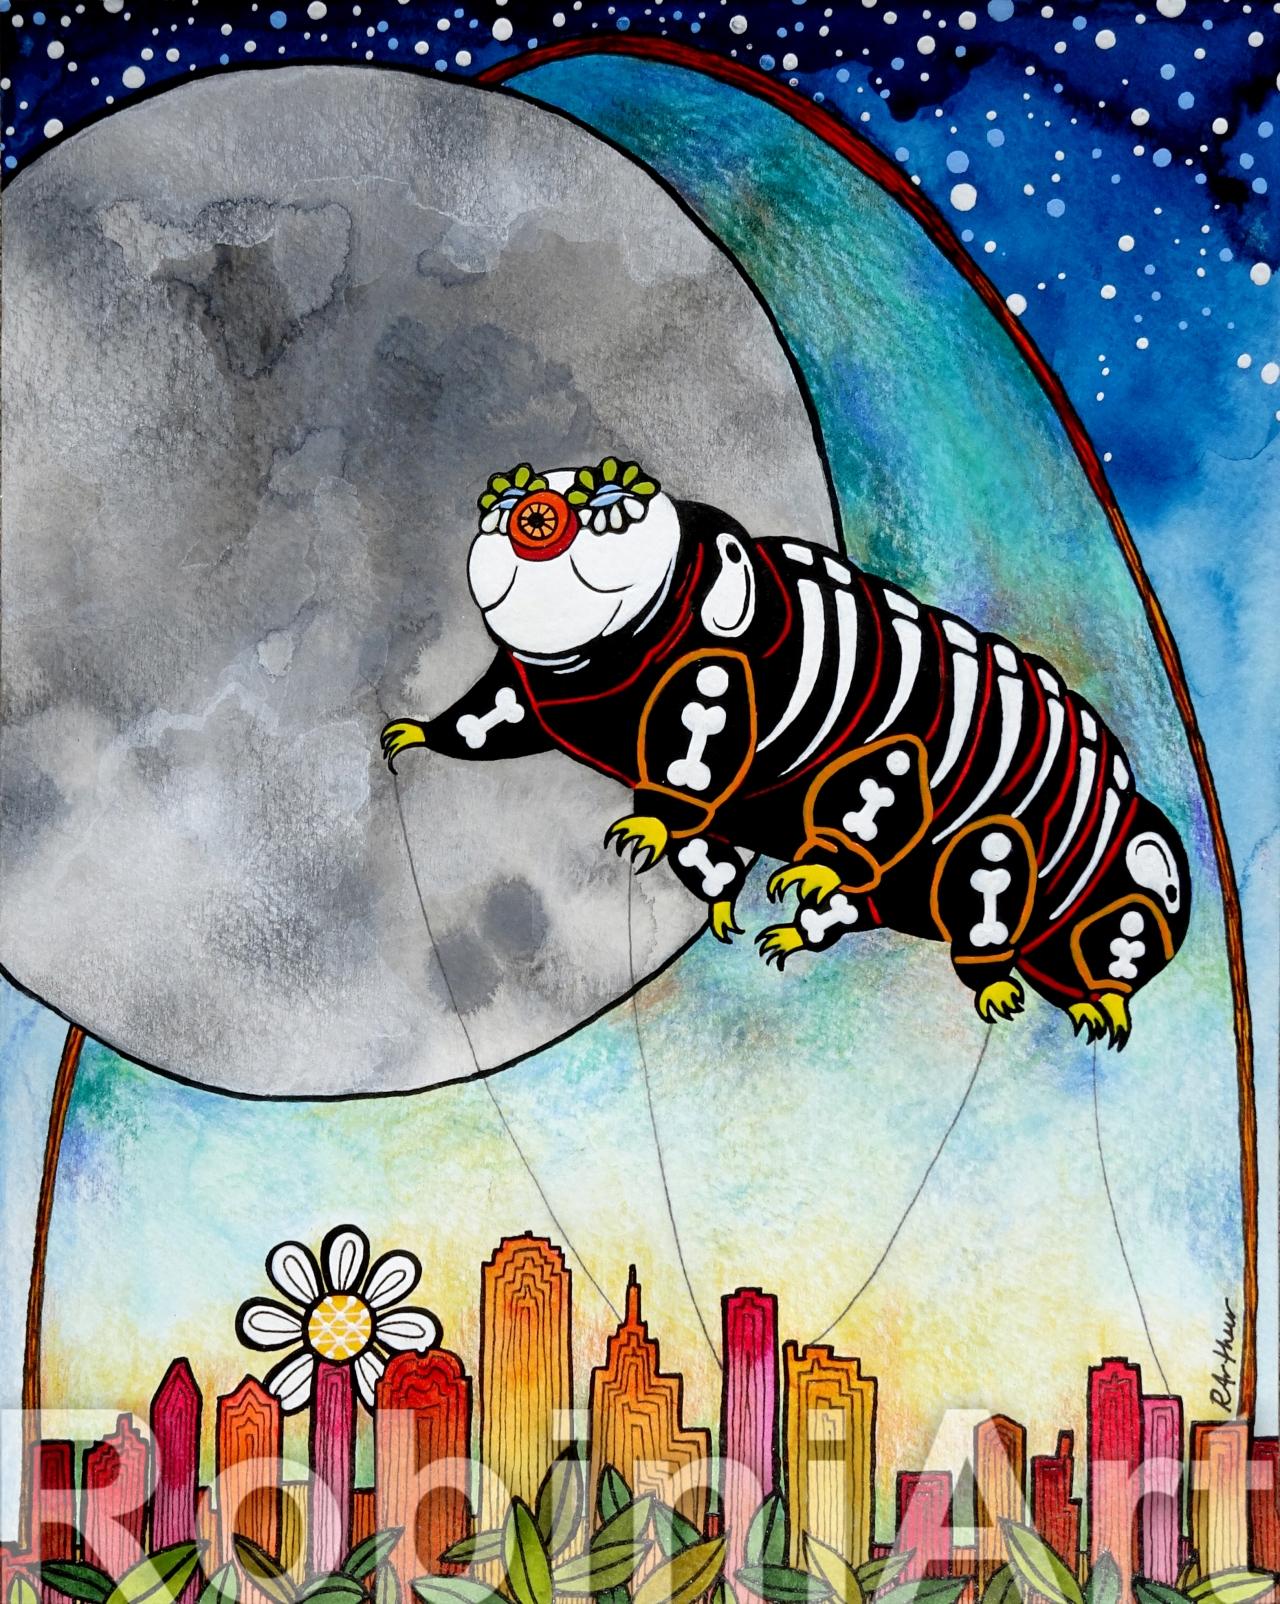 Tardigrade Painting by Robin Arthur aka RobiniArt 2018